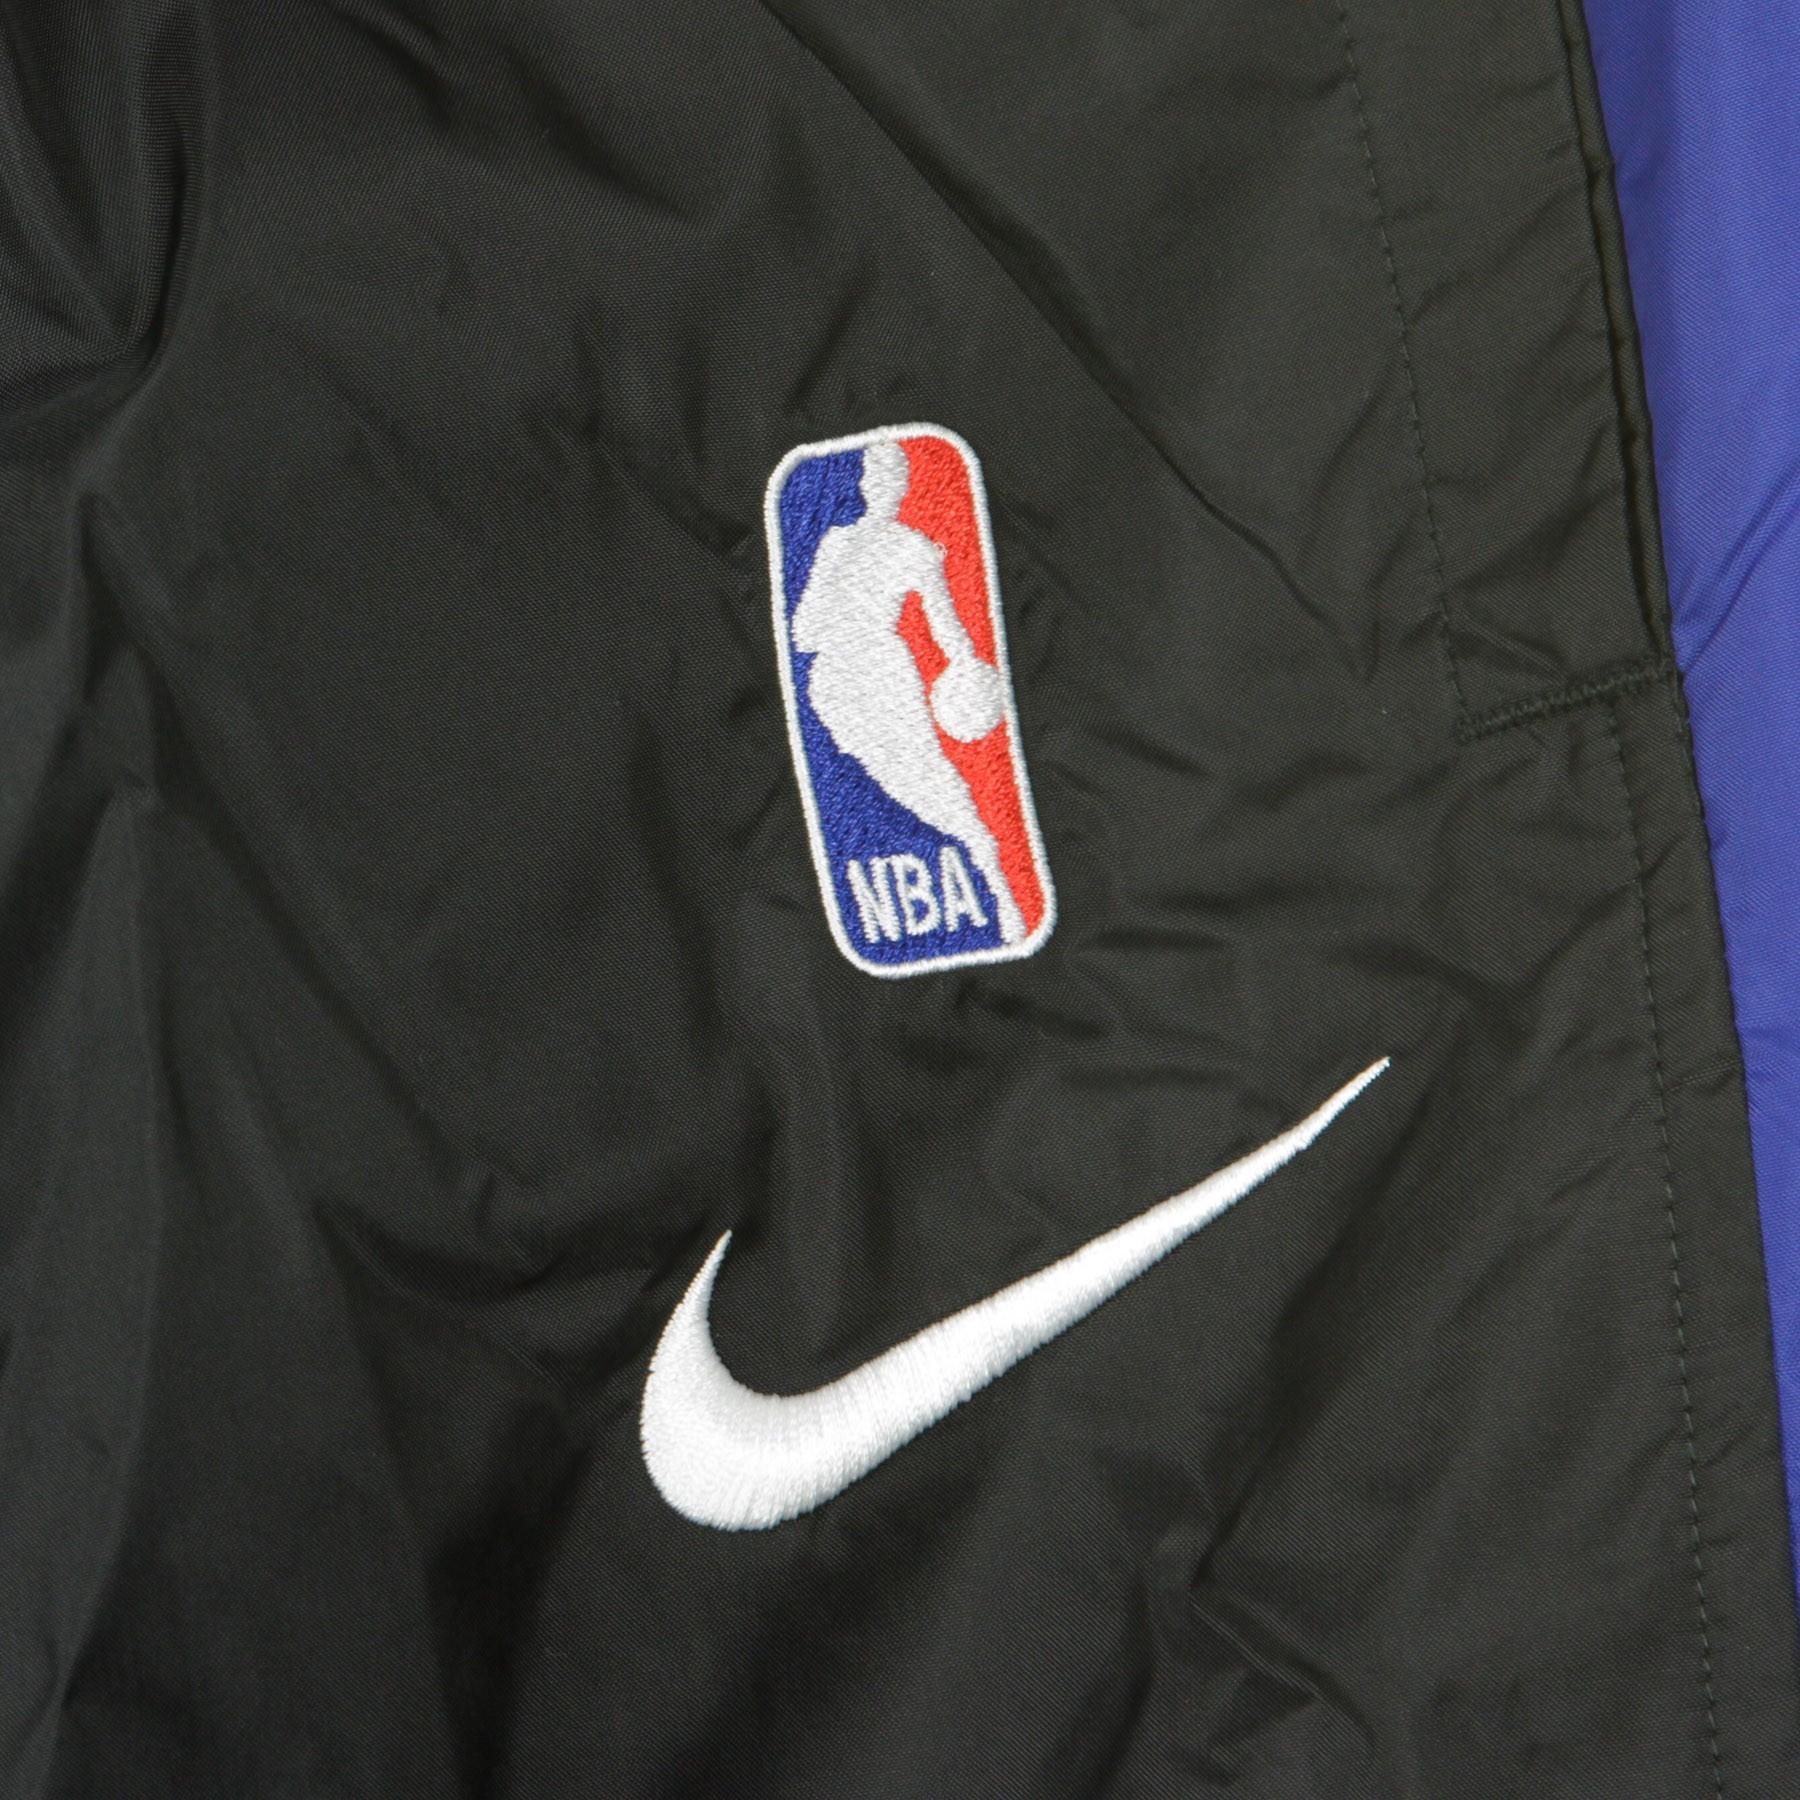 COMPLETO TUTA NBA TRACKSUIT TEAM 31 COURTSIDE